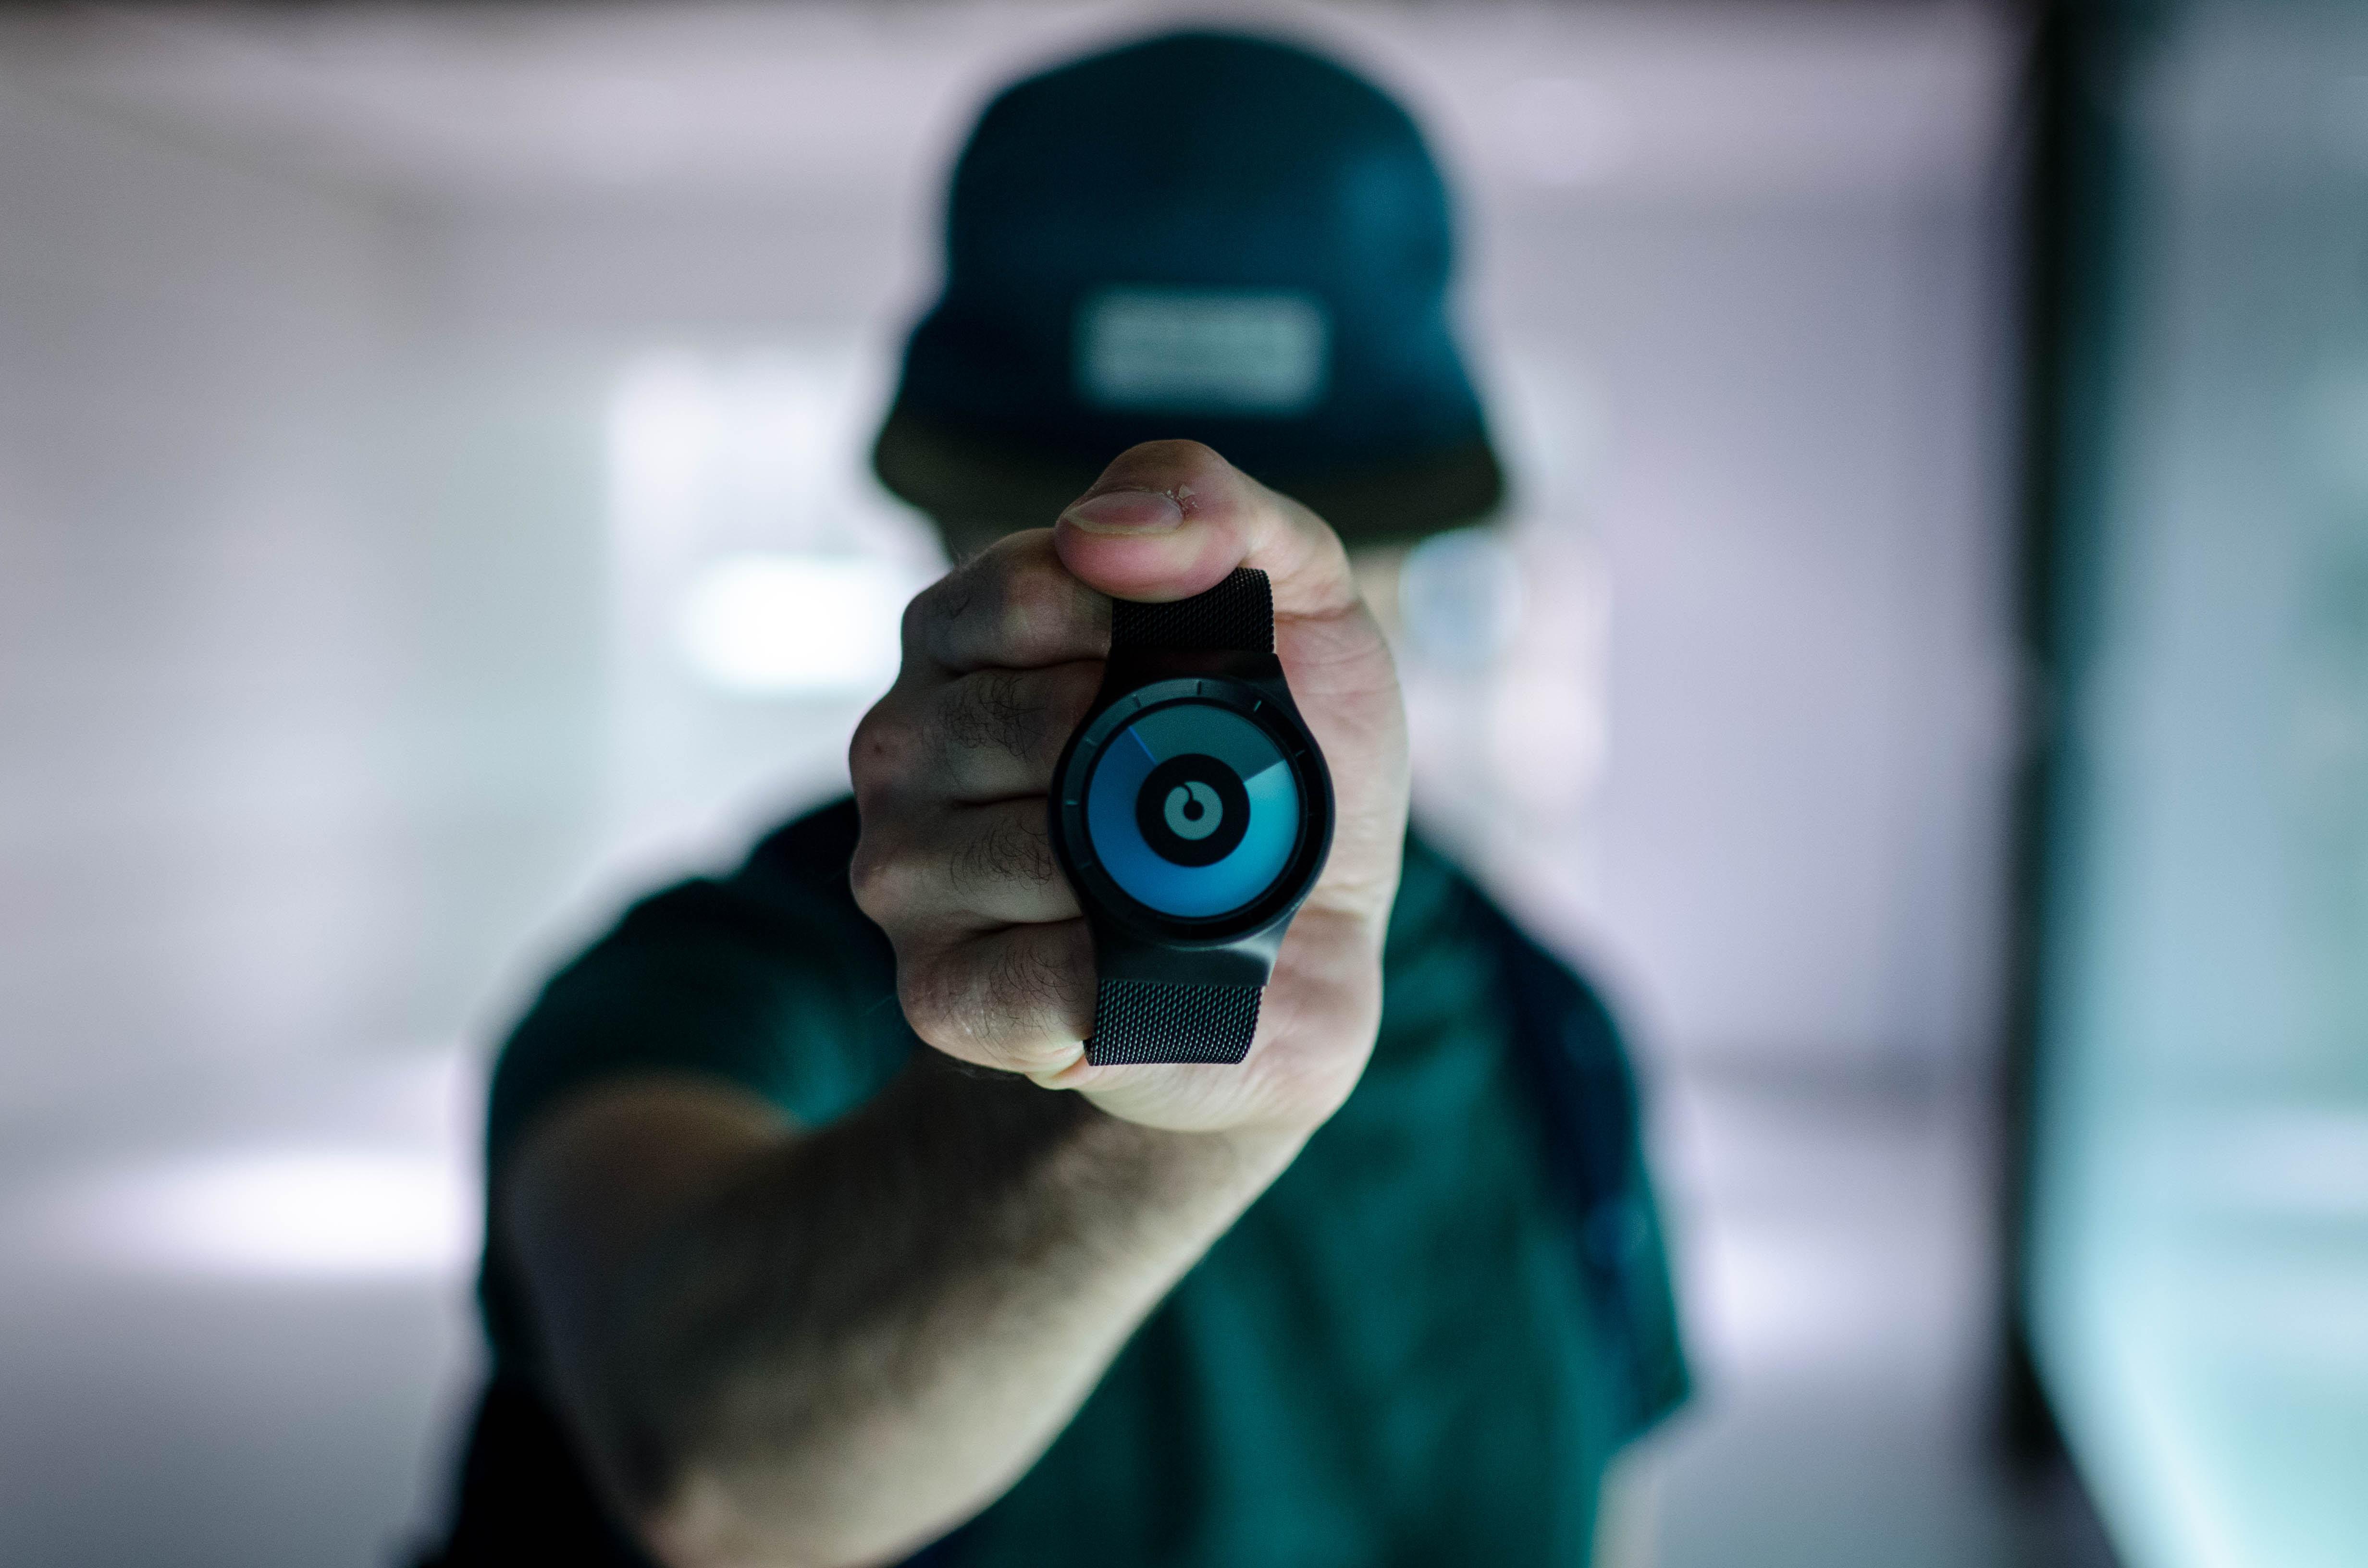 man holding black Ziiiro watch